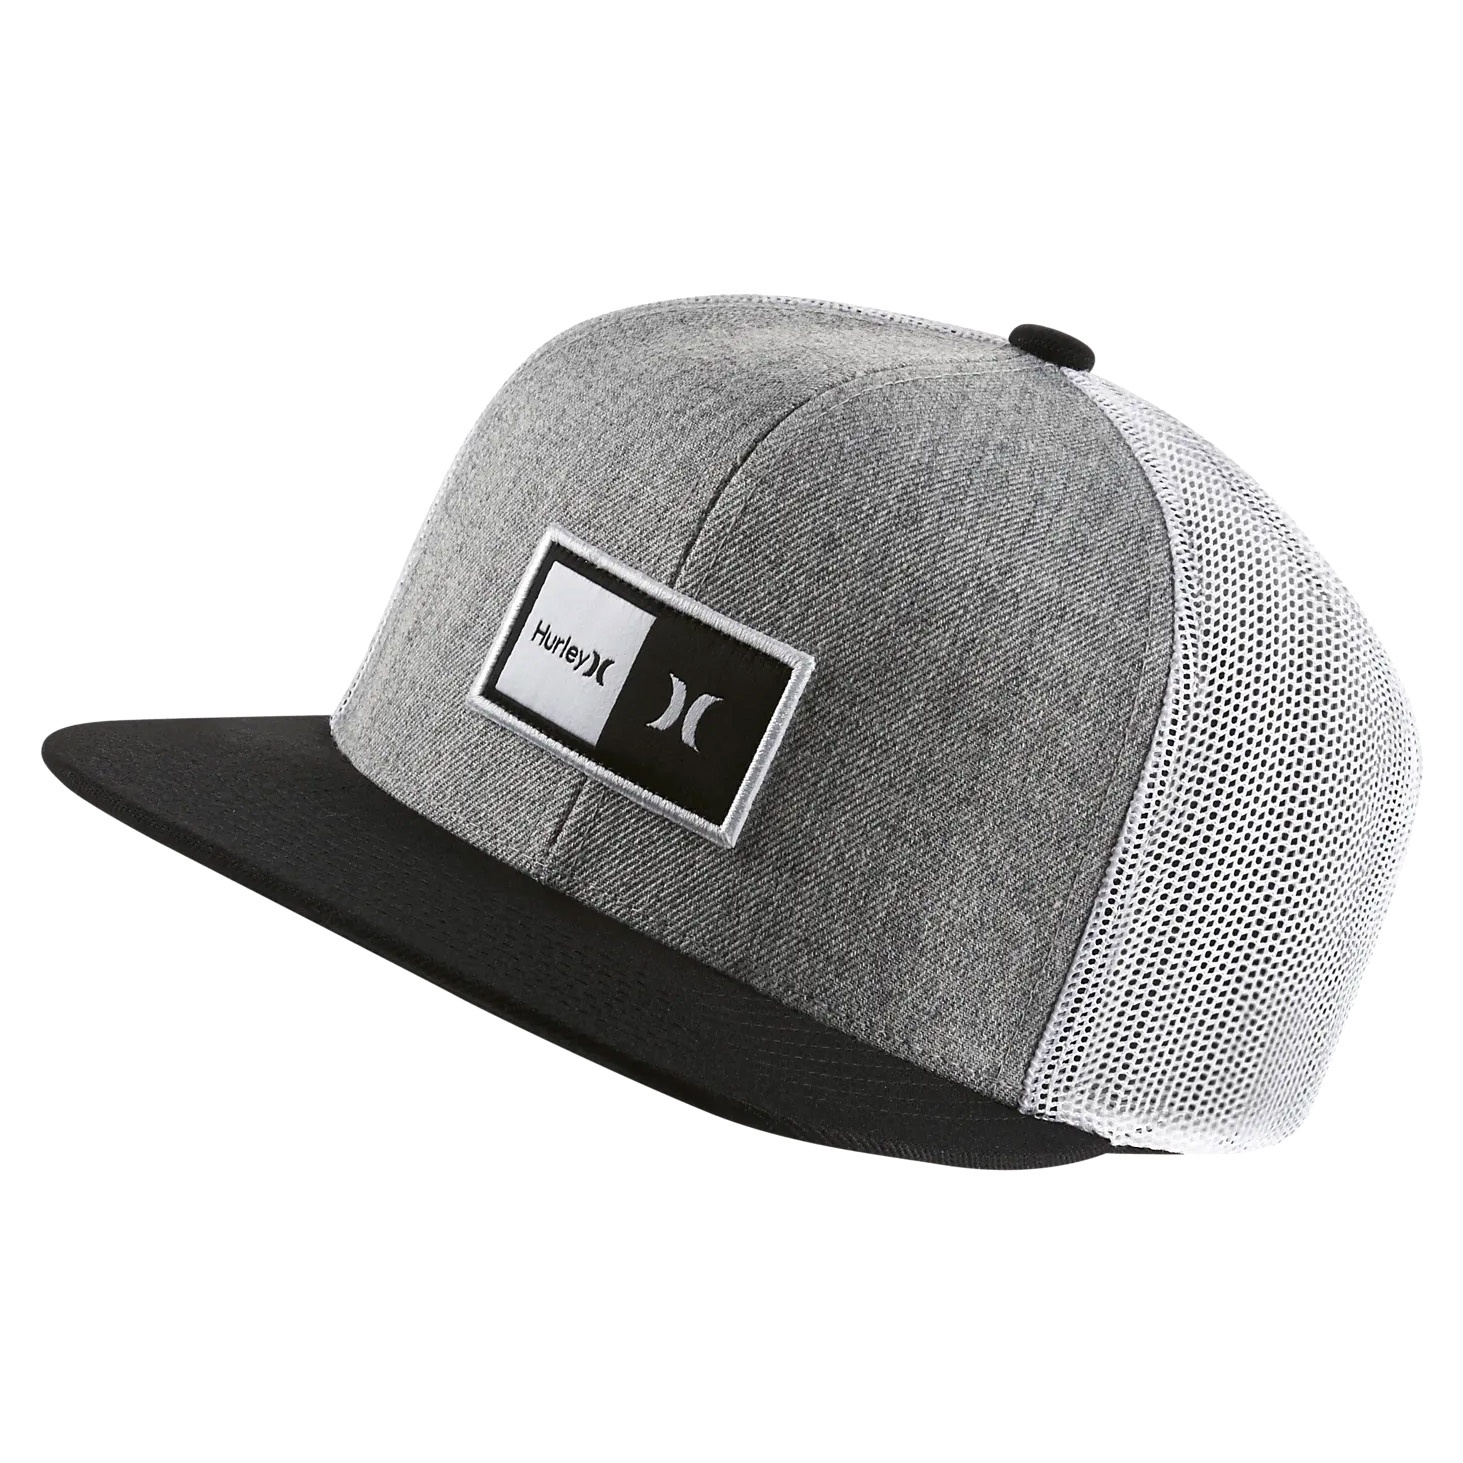 promo code cfeb2 ccdb6 Details about HURLEY Natural Trucker Snapback hat cap beanie surf skate  California logo white